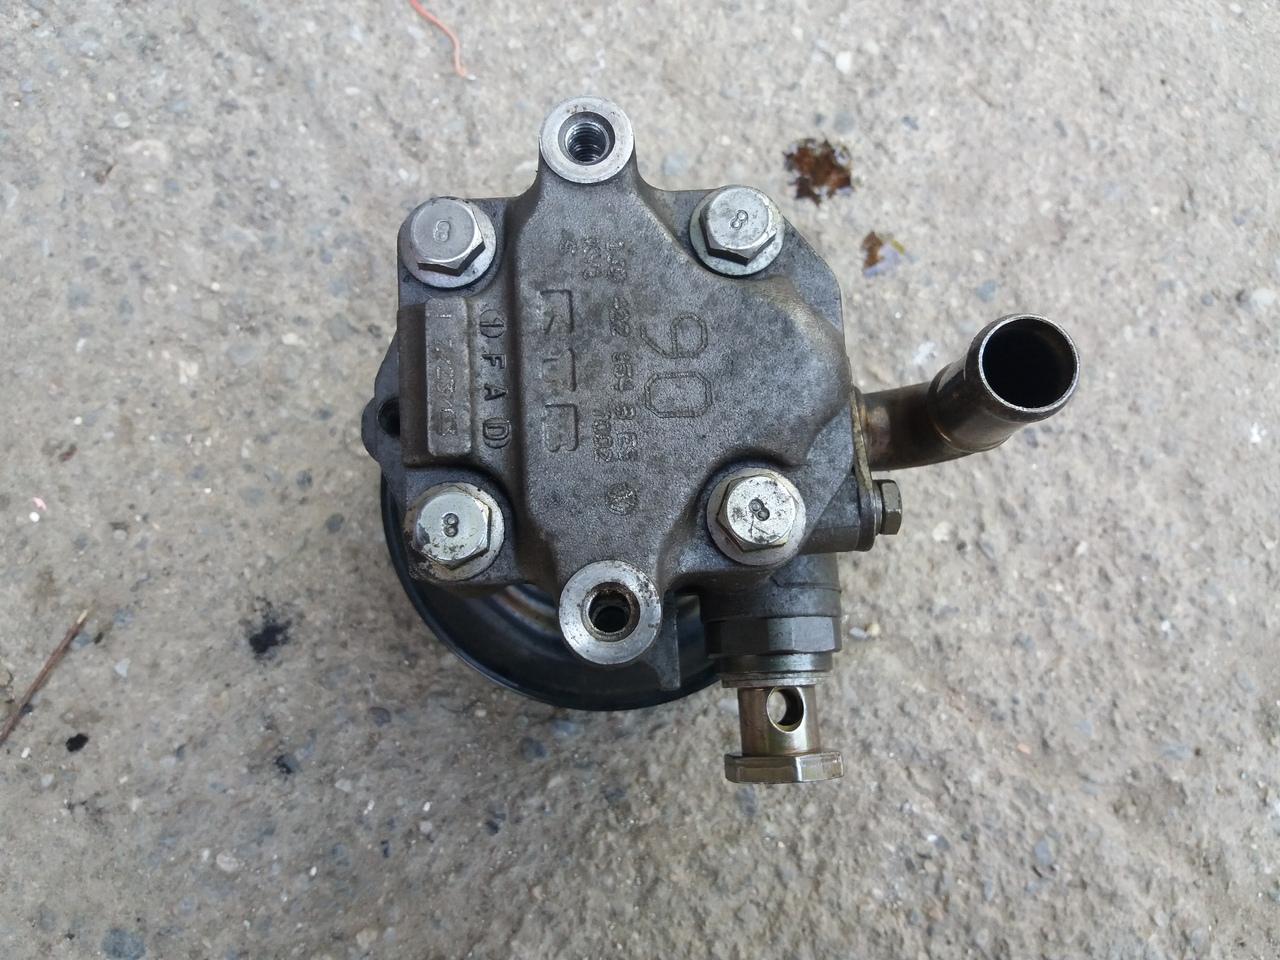 Pompa Servodirectie  Vw golf 4 Bora Seat Toledo Leon Audi Skoda 1.4 1.6 16 V